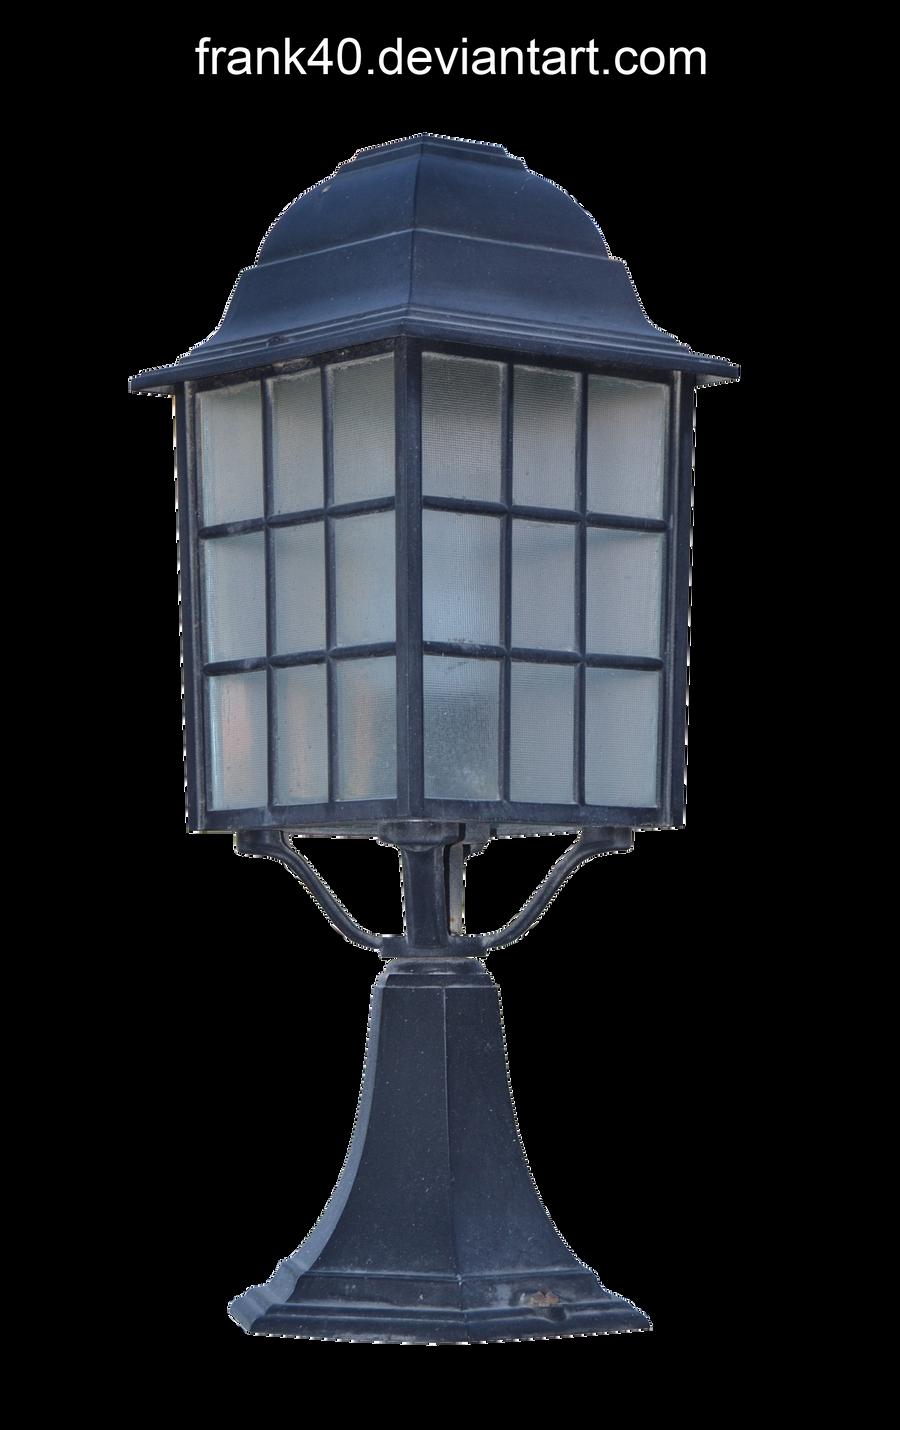 Lamp by FrankAndCarySTOCK